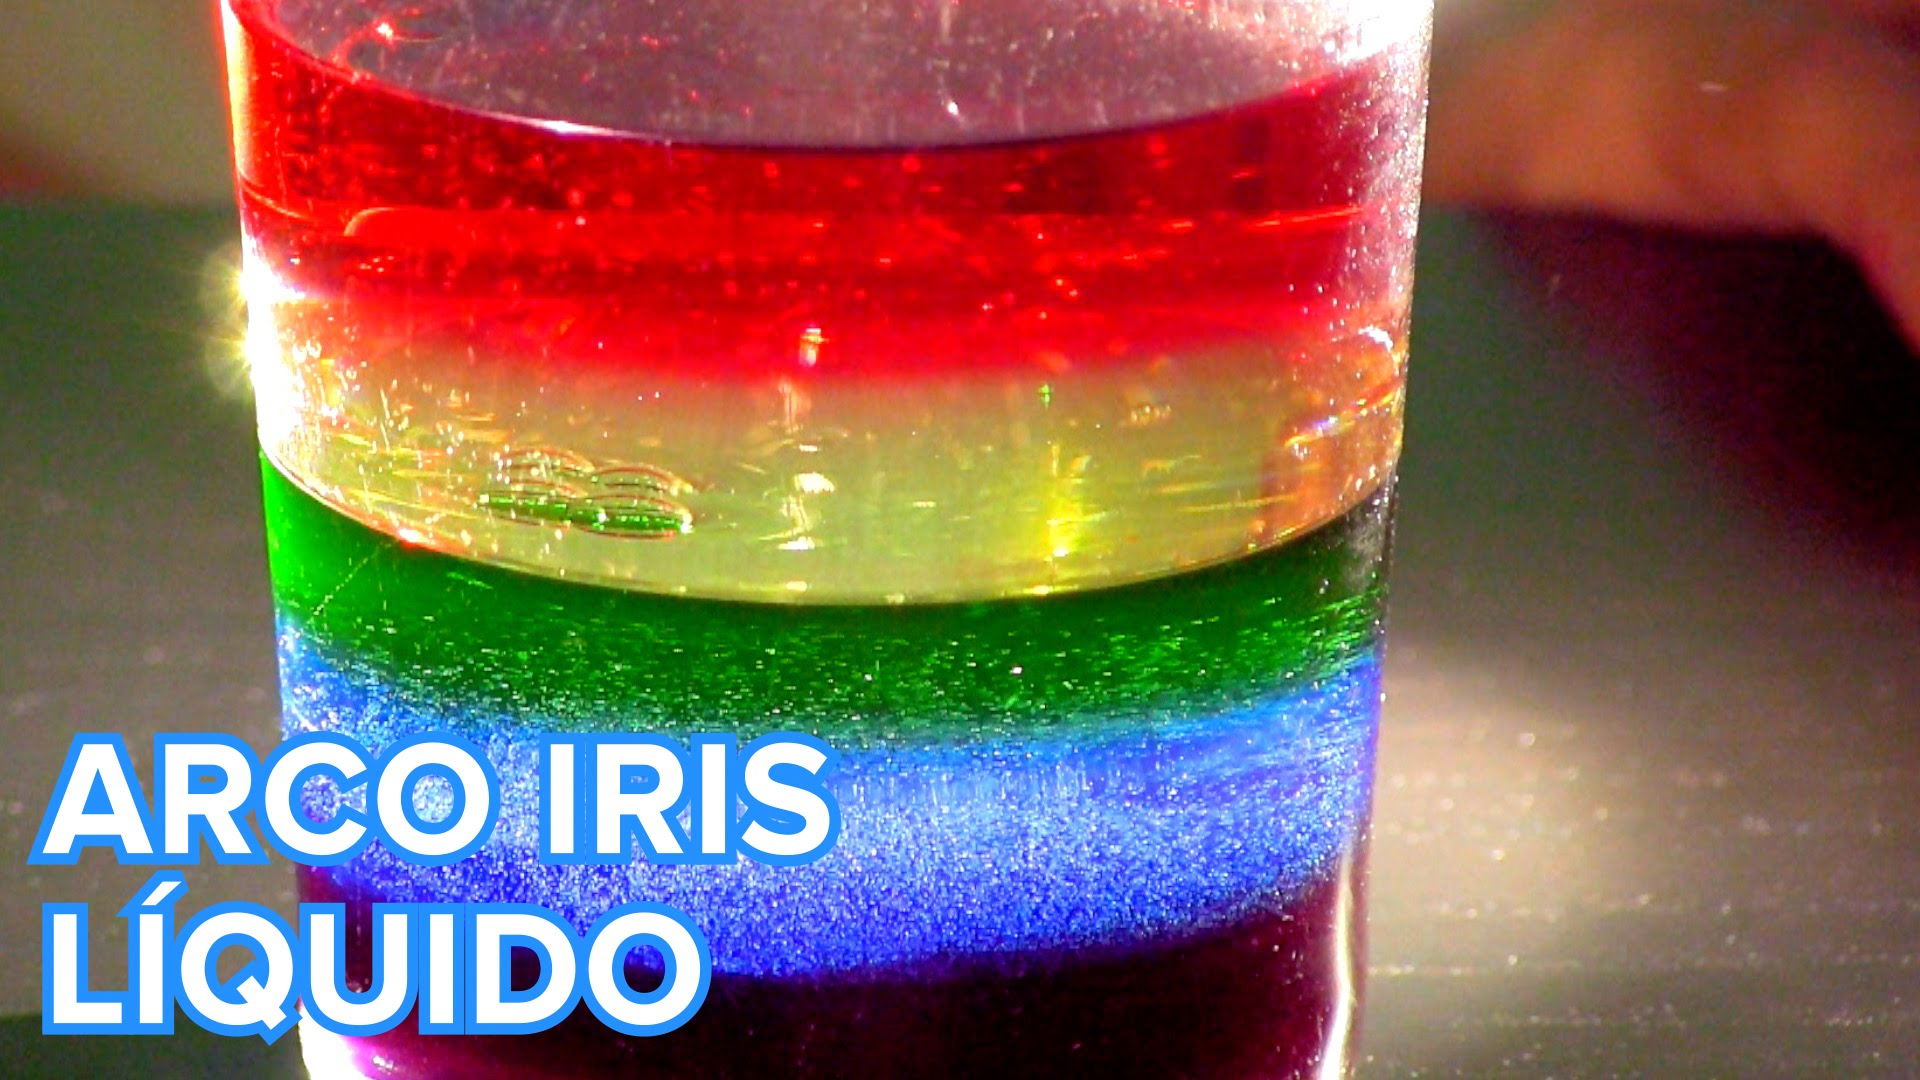 EXPERIMENTO: ARCO IRIS LÍQUIDO | Portal educativo educaciondivertida.com